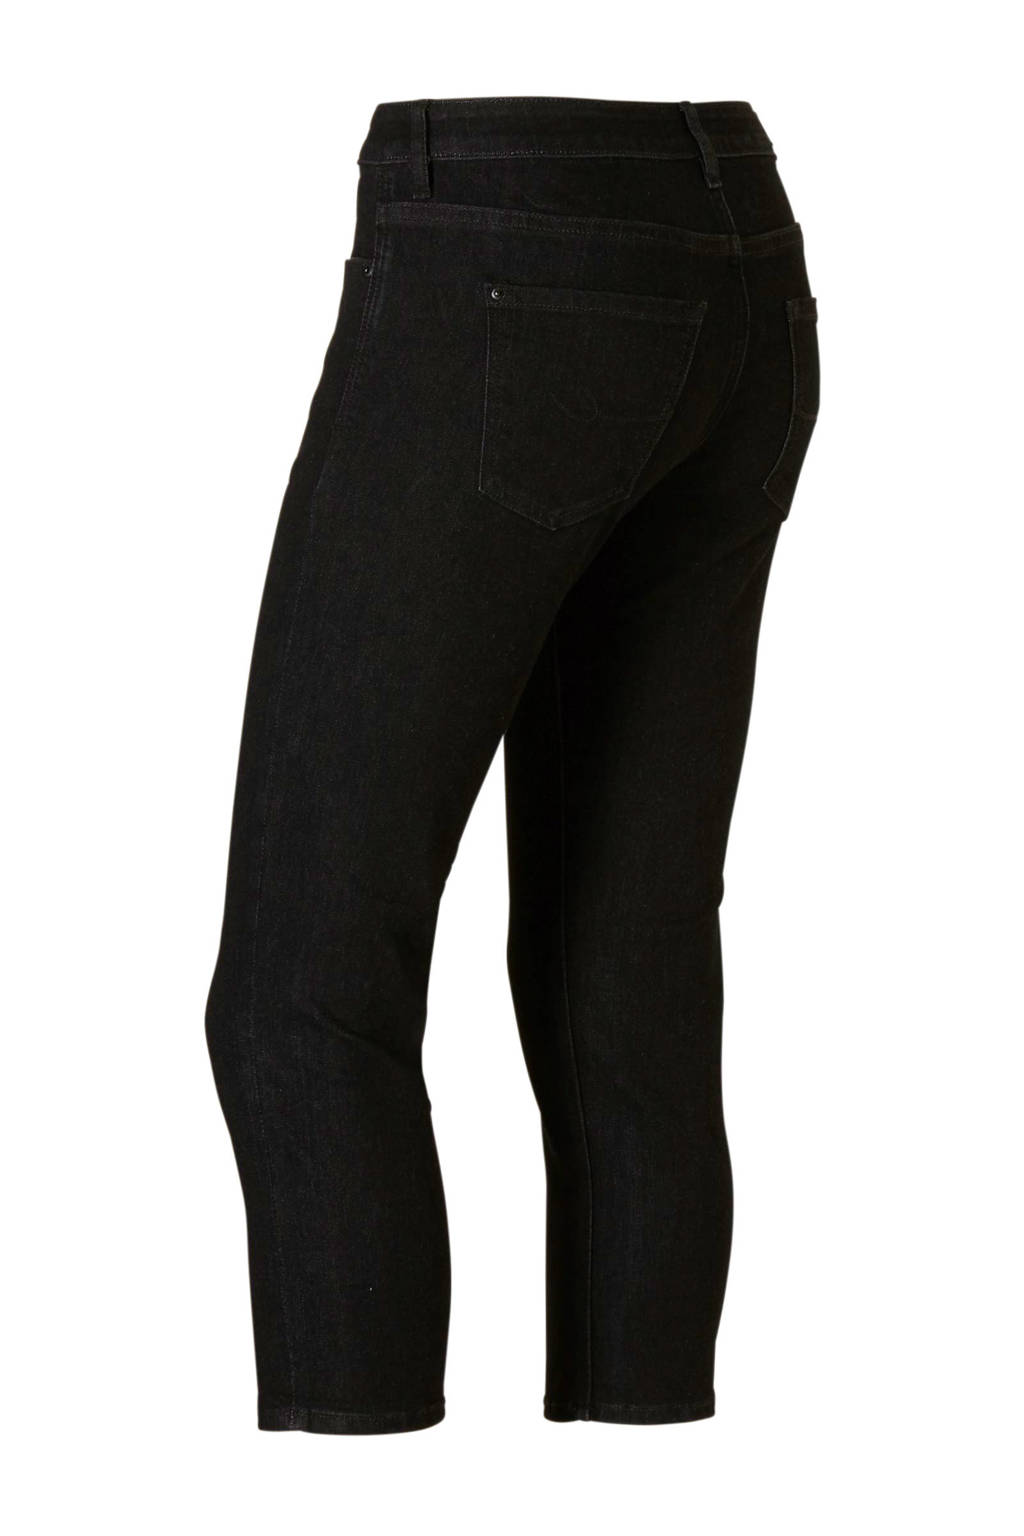 edc Women jeans zwart, Zwart